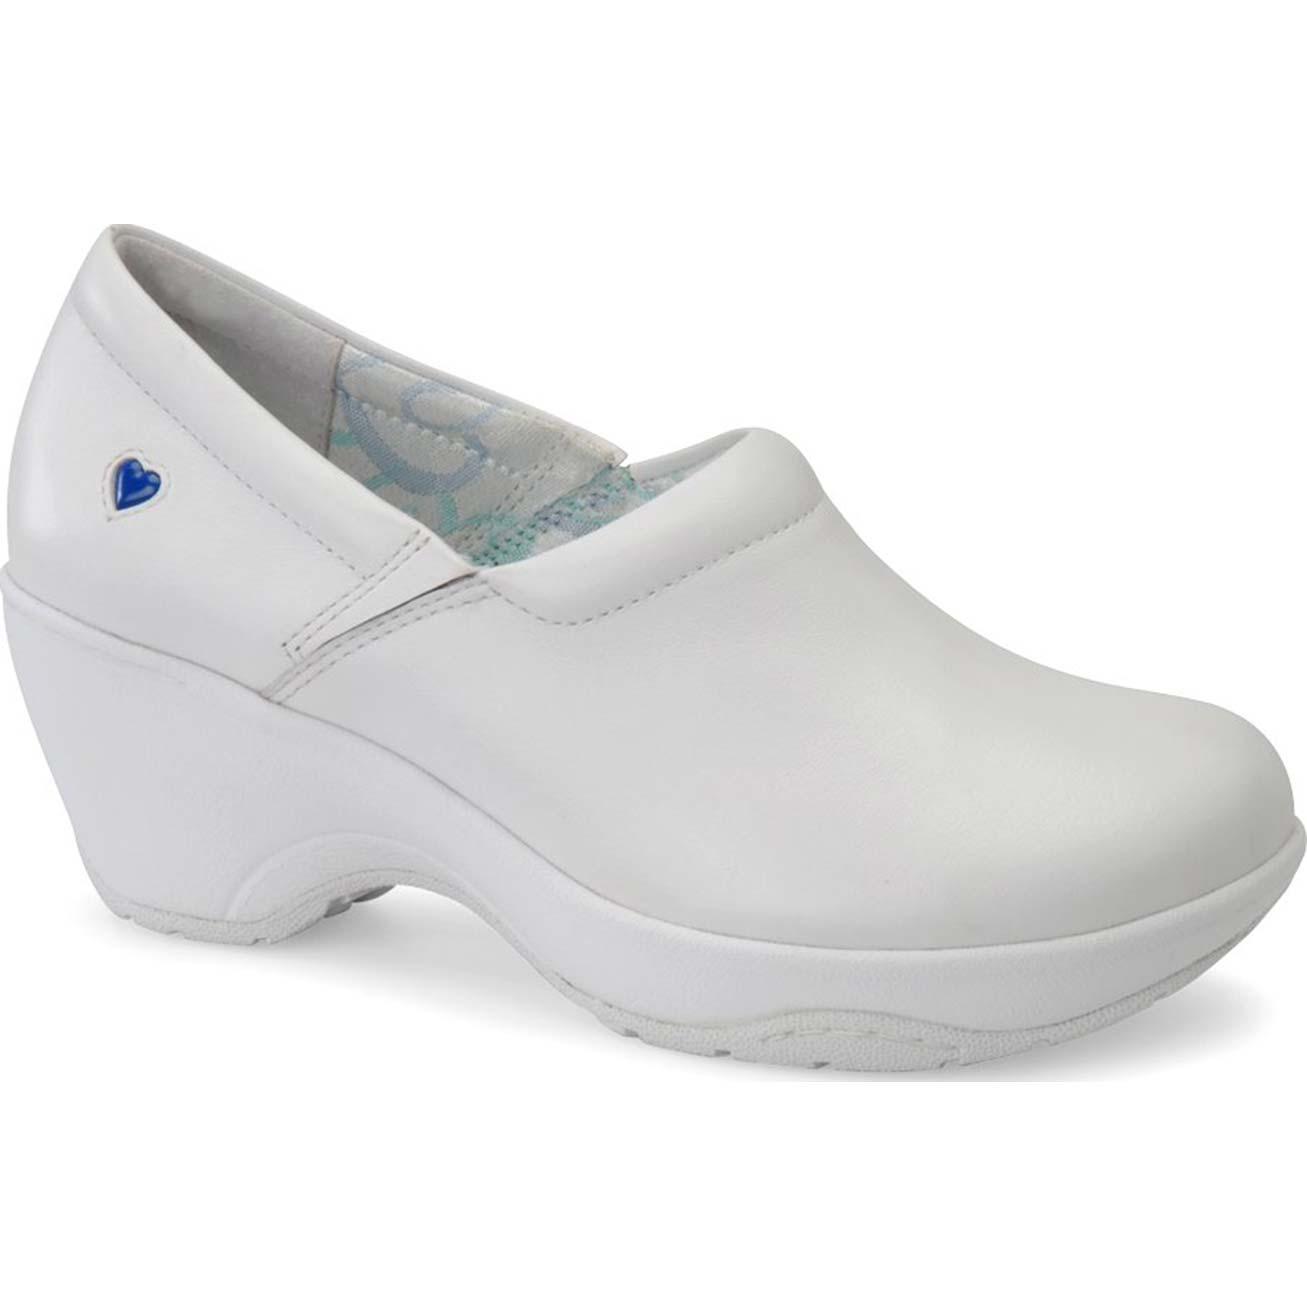 White Clog Nursing Shoes